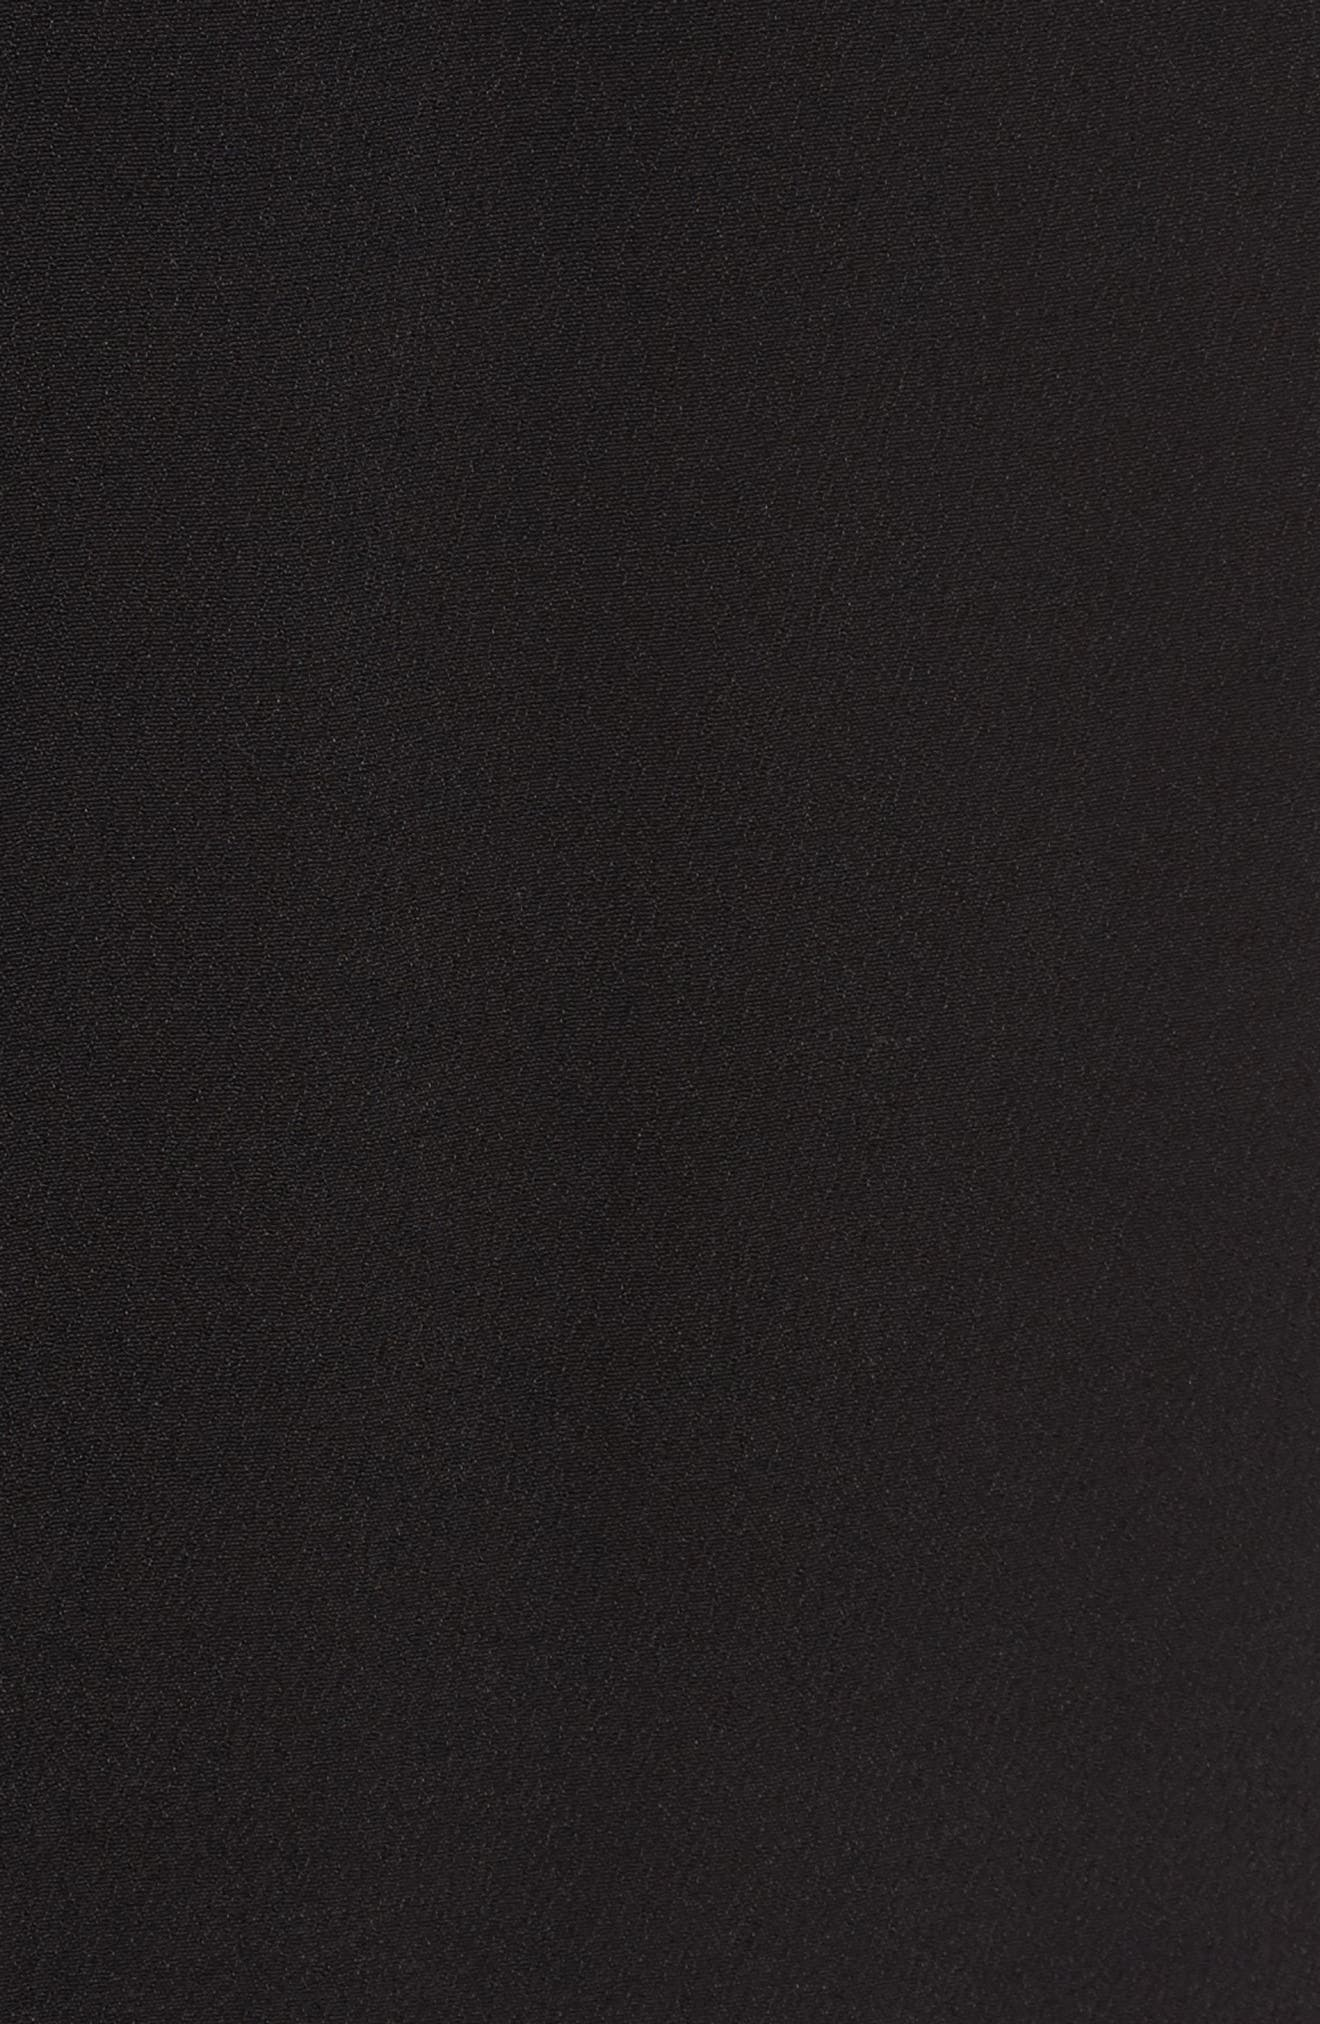 Illusion Sleeve Top,                             Alternate thumbnail 5, color,                             BLACK